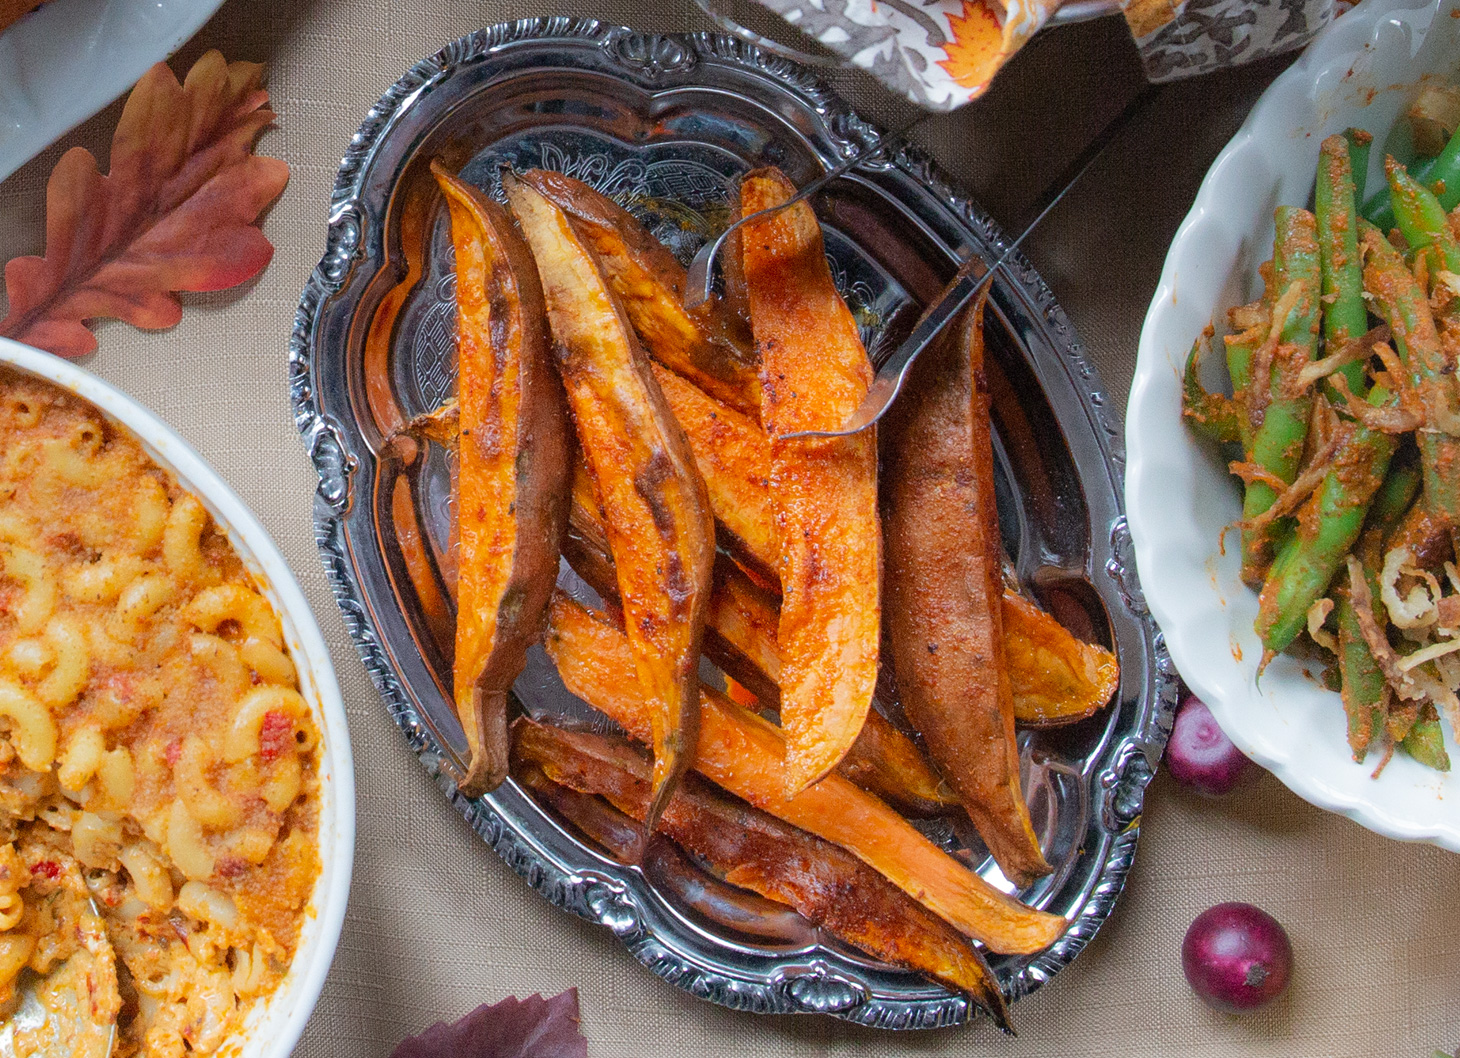 h459-roasted-sweet-potatoes-with-berbere.jpg